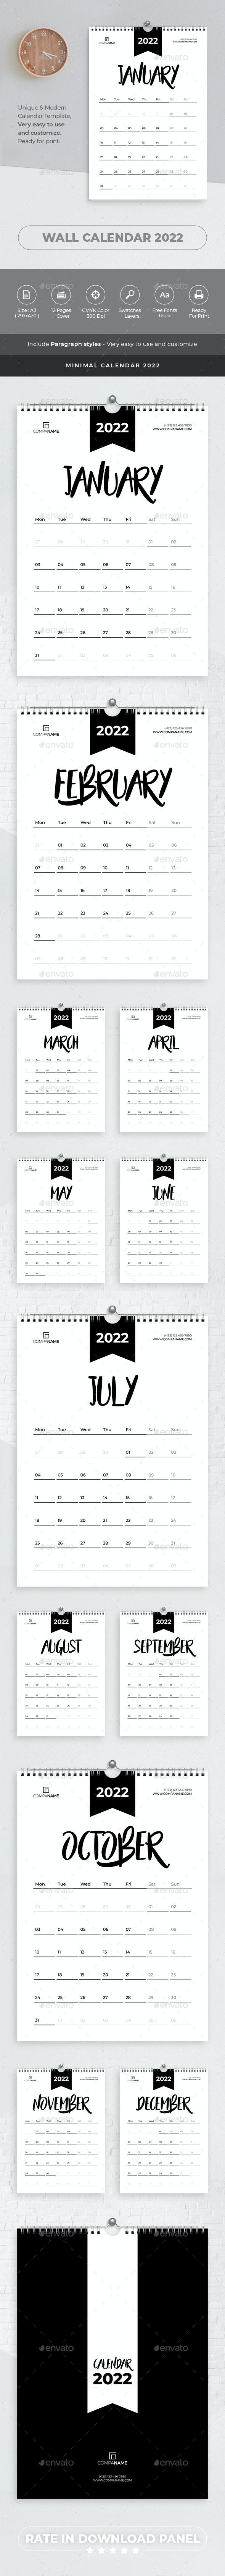 Minimal Calendar 2022 - Calendars Stationery